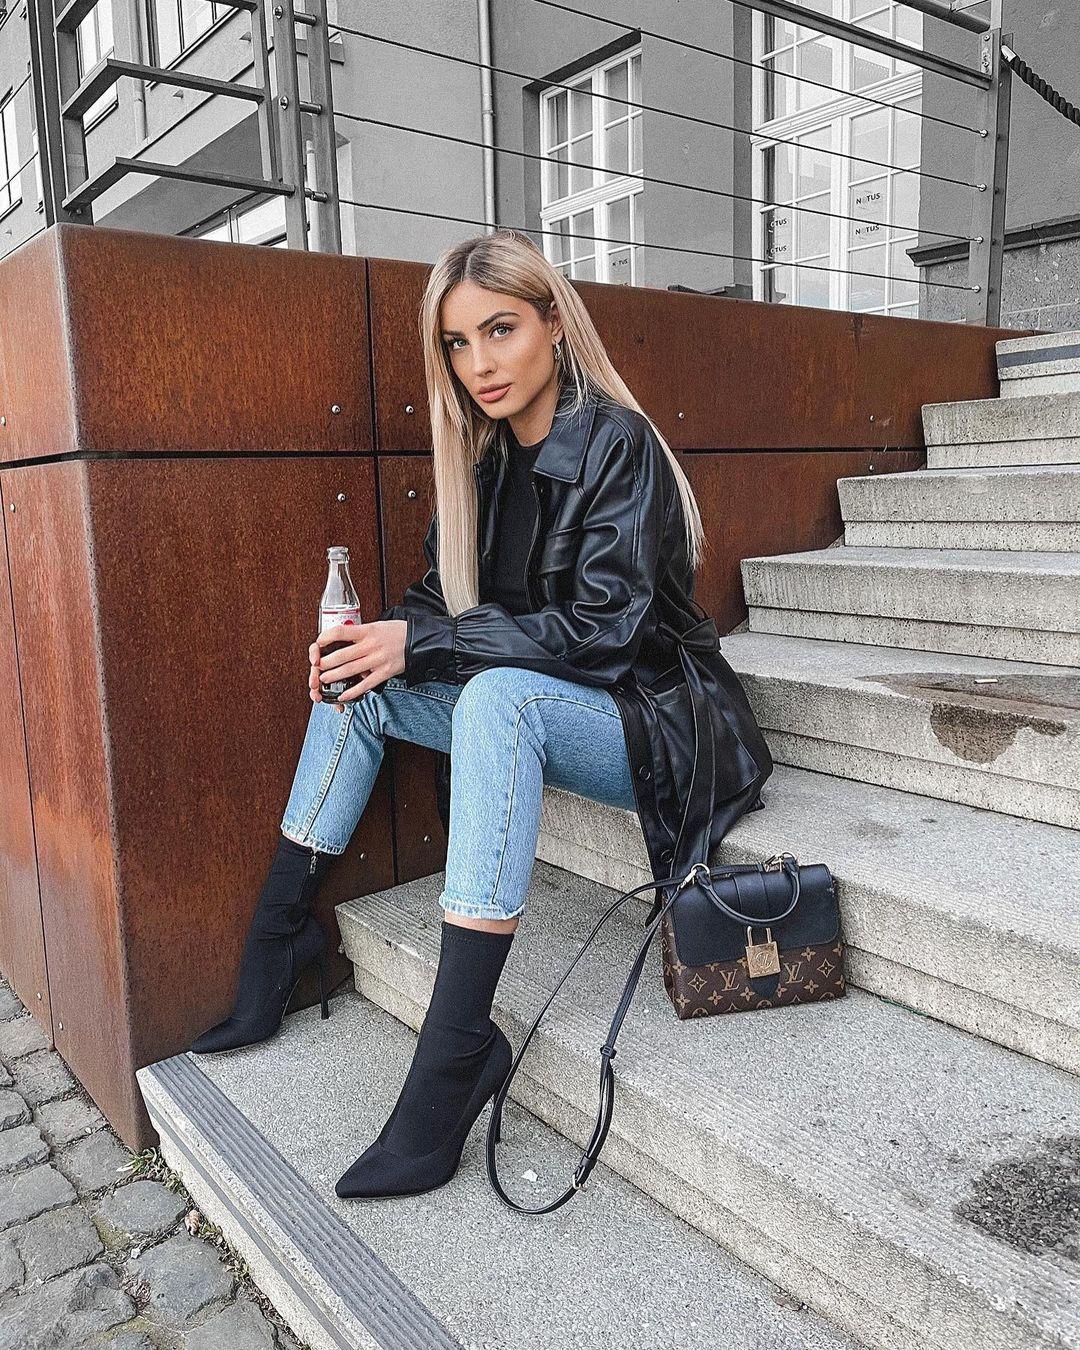 Doreen-Petrova-Wallpapers-Insta-Fit-Bio-4